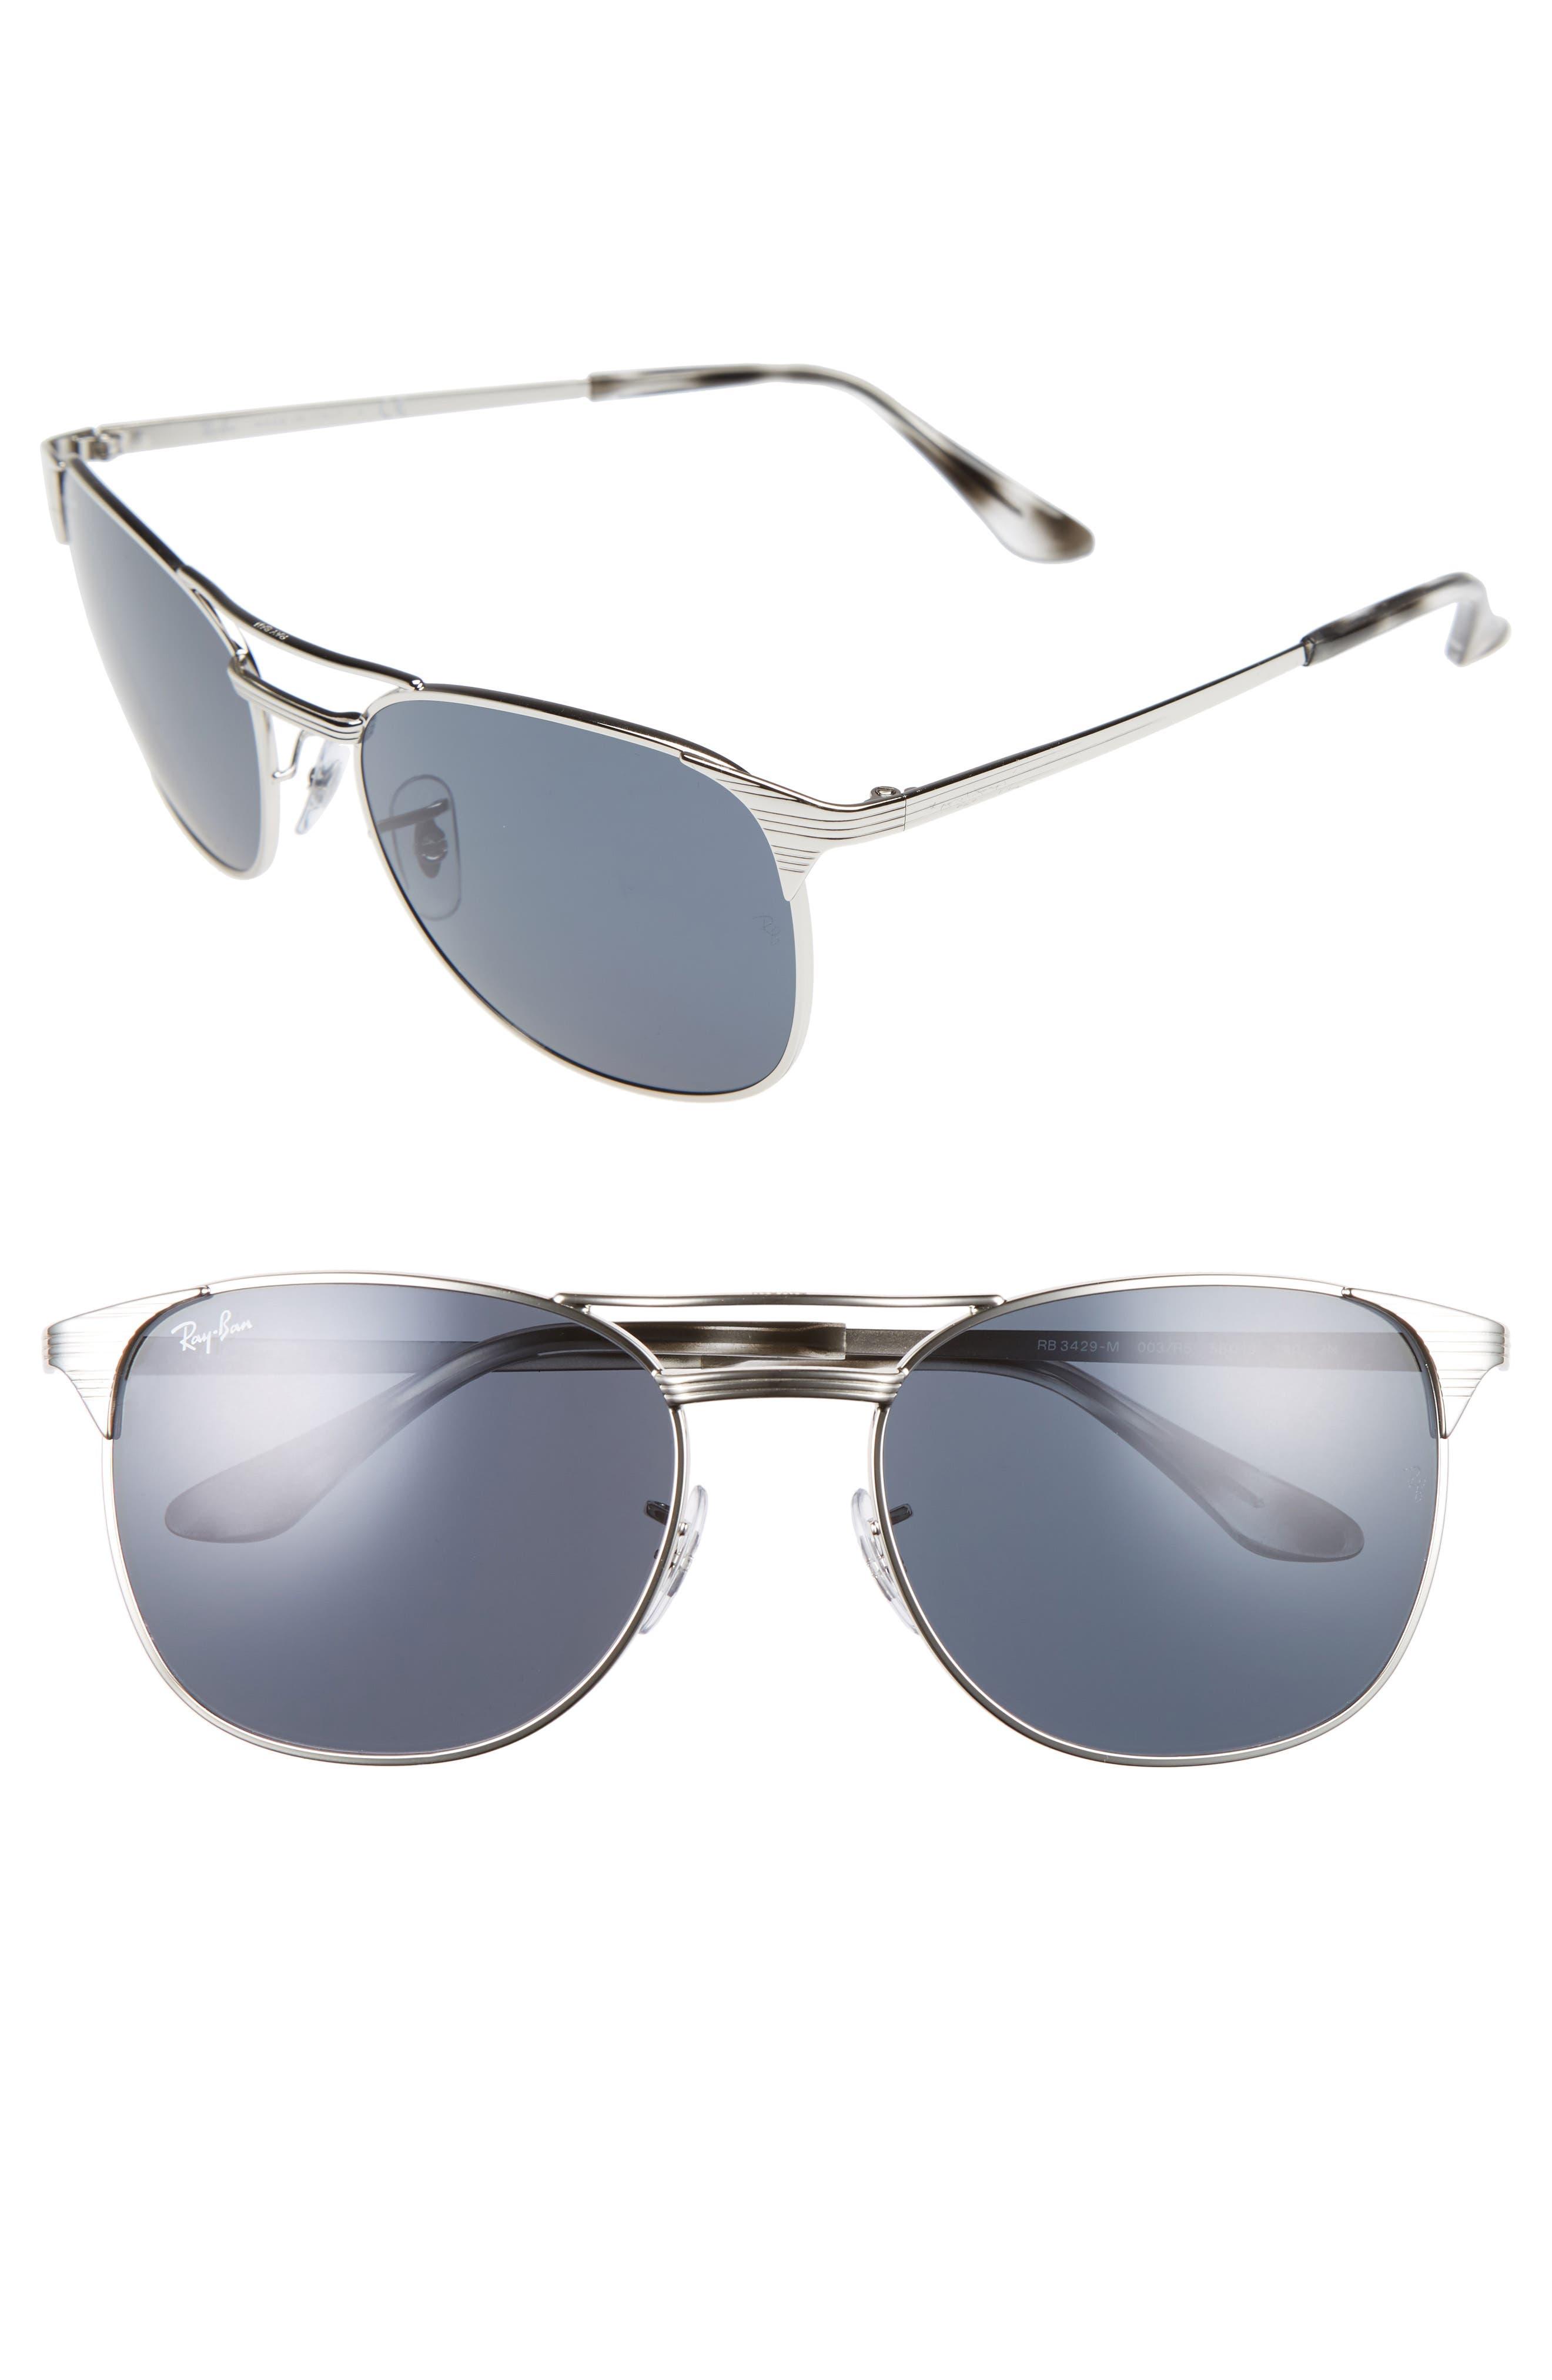 Main Image - Ray-Ban Signet 58mm Square Sunglasses